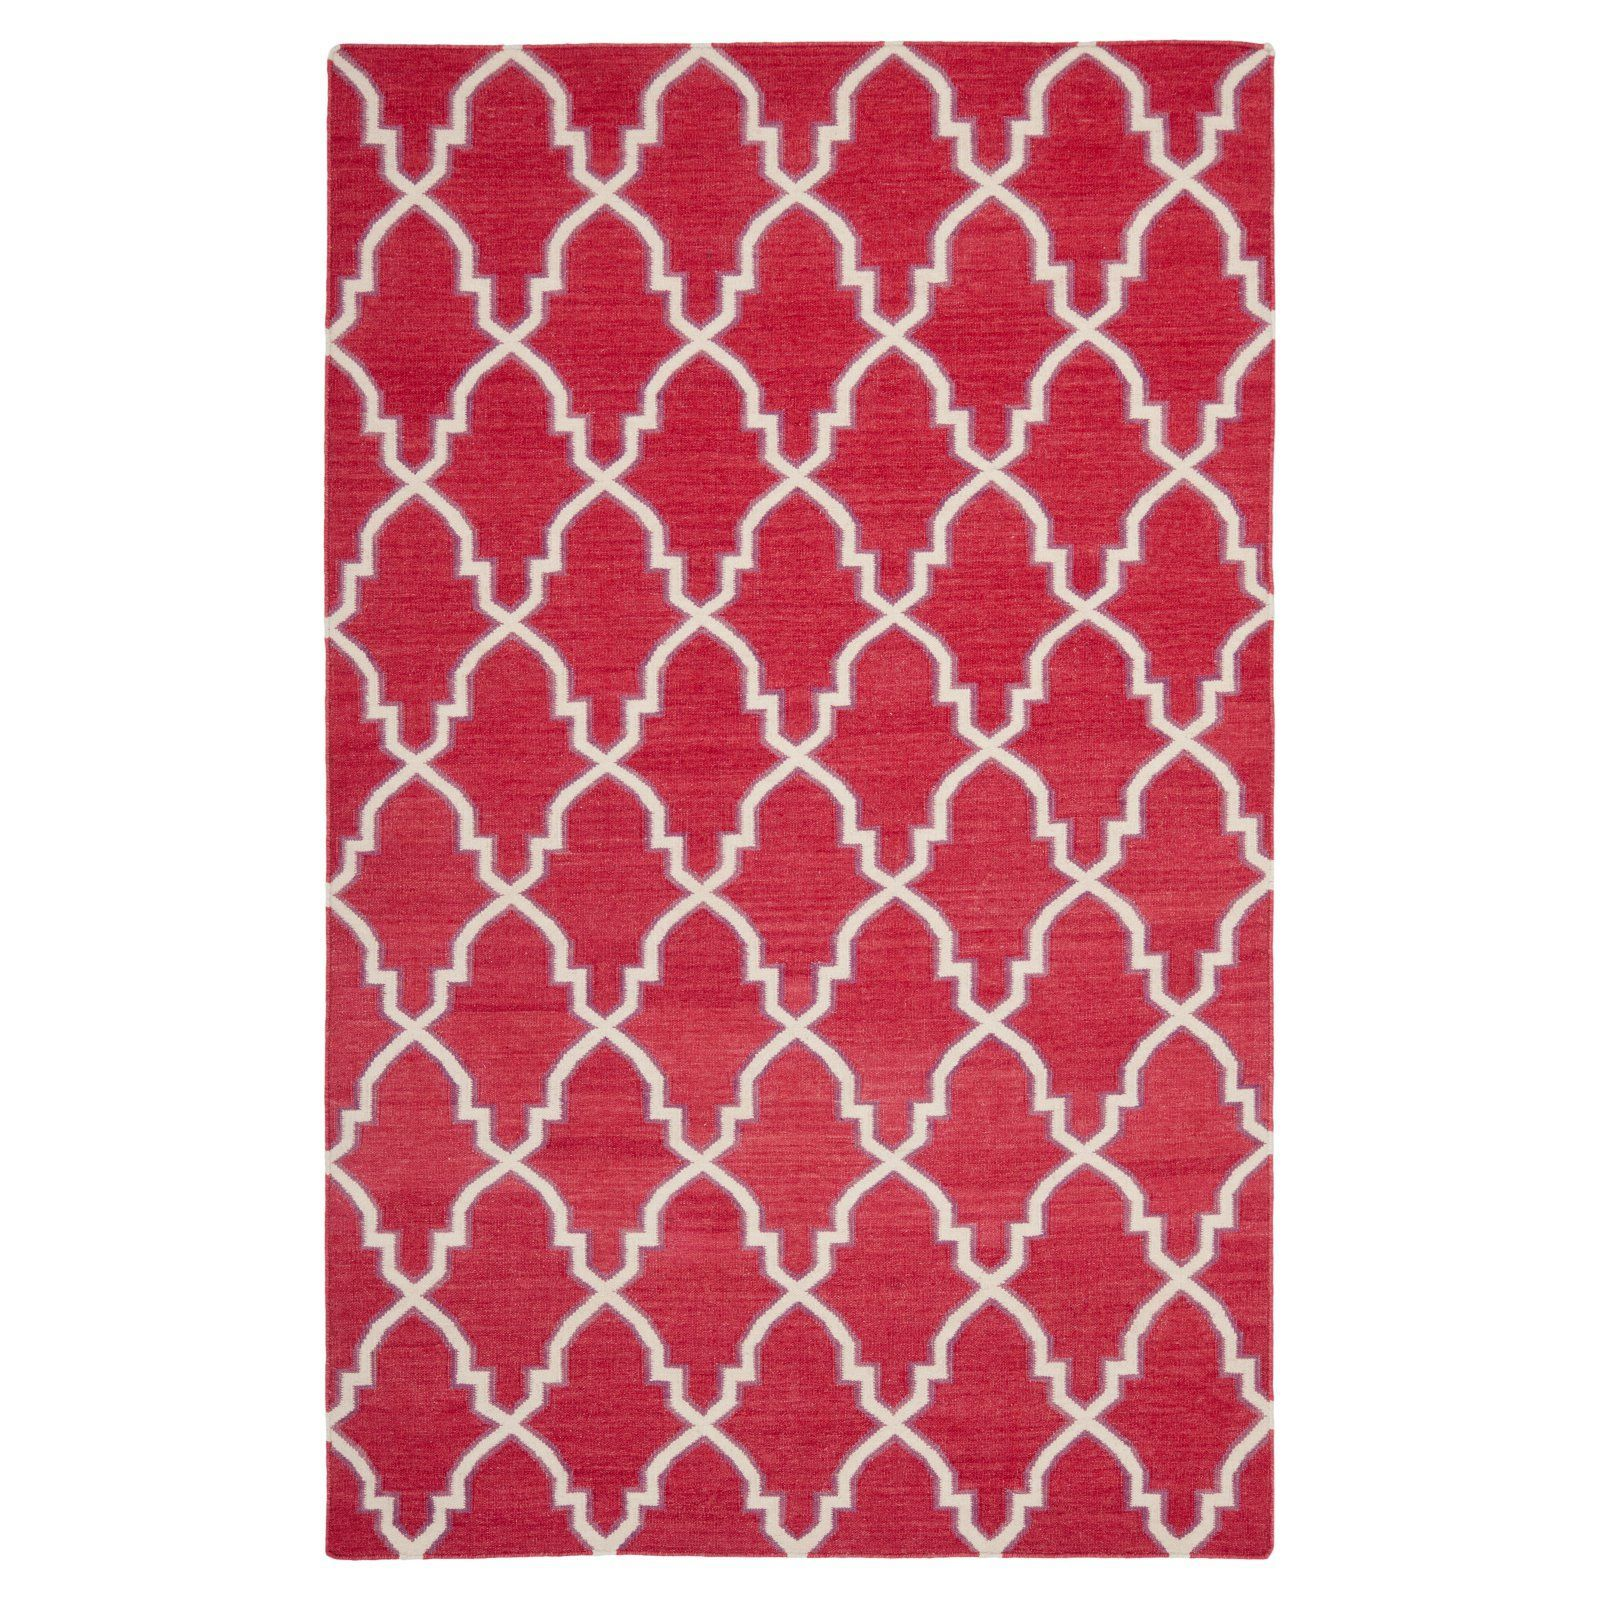 Safavieh Dhu564a Dhurries Teppich Hellblau Elfenbein Größe 5 X 8 Ft Products Area Rugs Red Wool Rug Southwestern Area Rugs